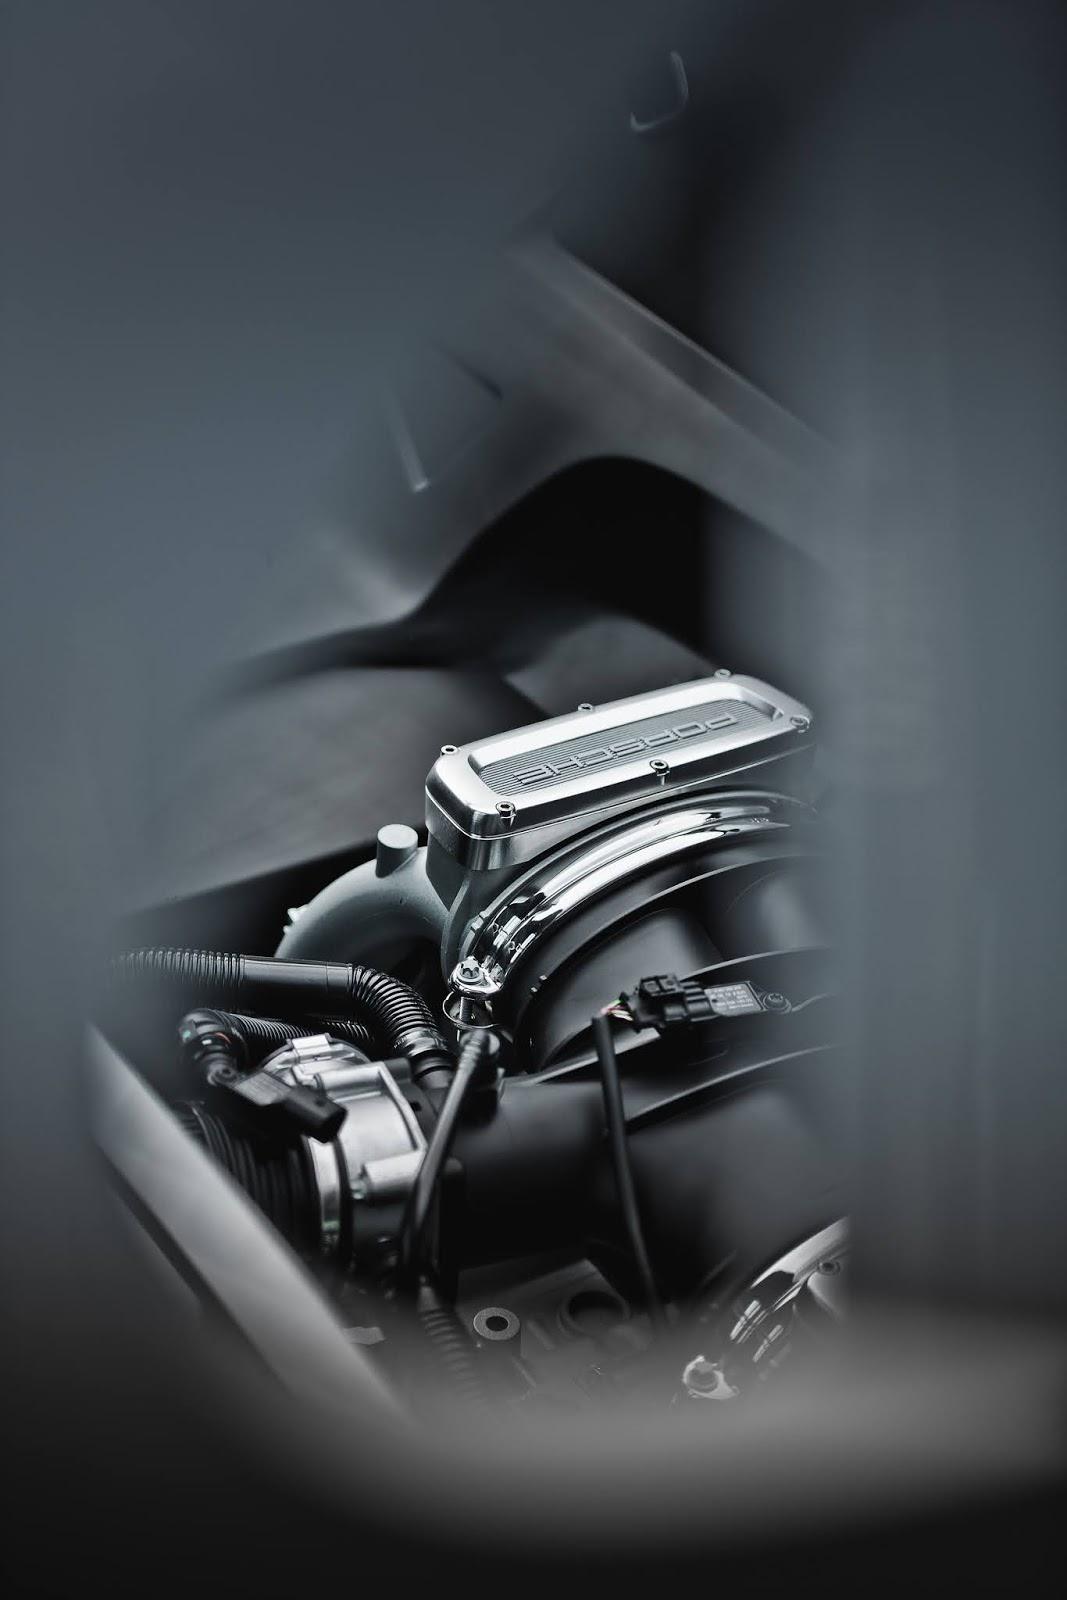 CVS0569 Le Mans Living Legend : Το πρωτότυπο που γέννησε την 718 Cayman GT4 LE MANS, Porsche, Porsche Le Mans, Porsche Unseen, sportscar, supercar, supercars, zblog, ειδήσεις